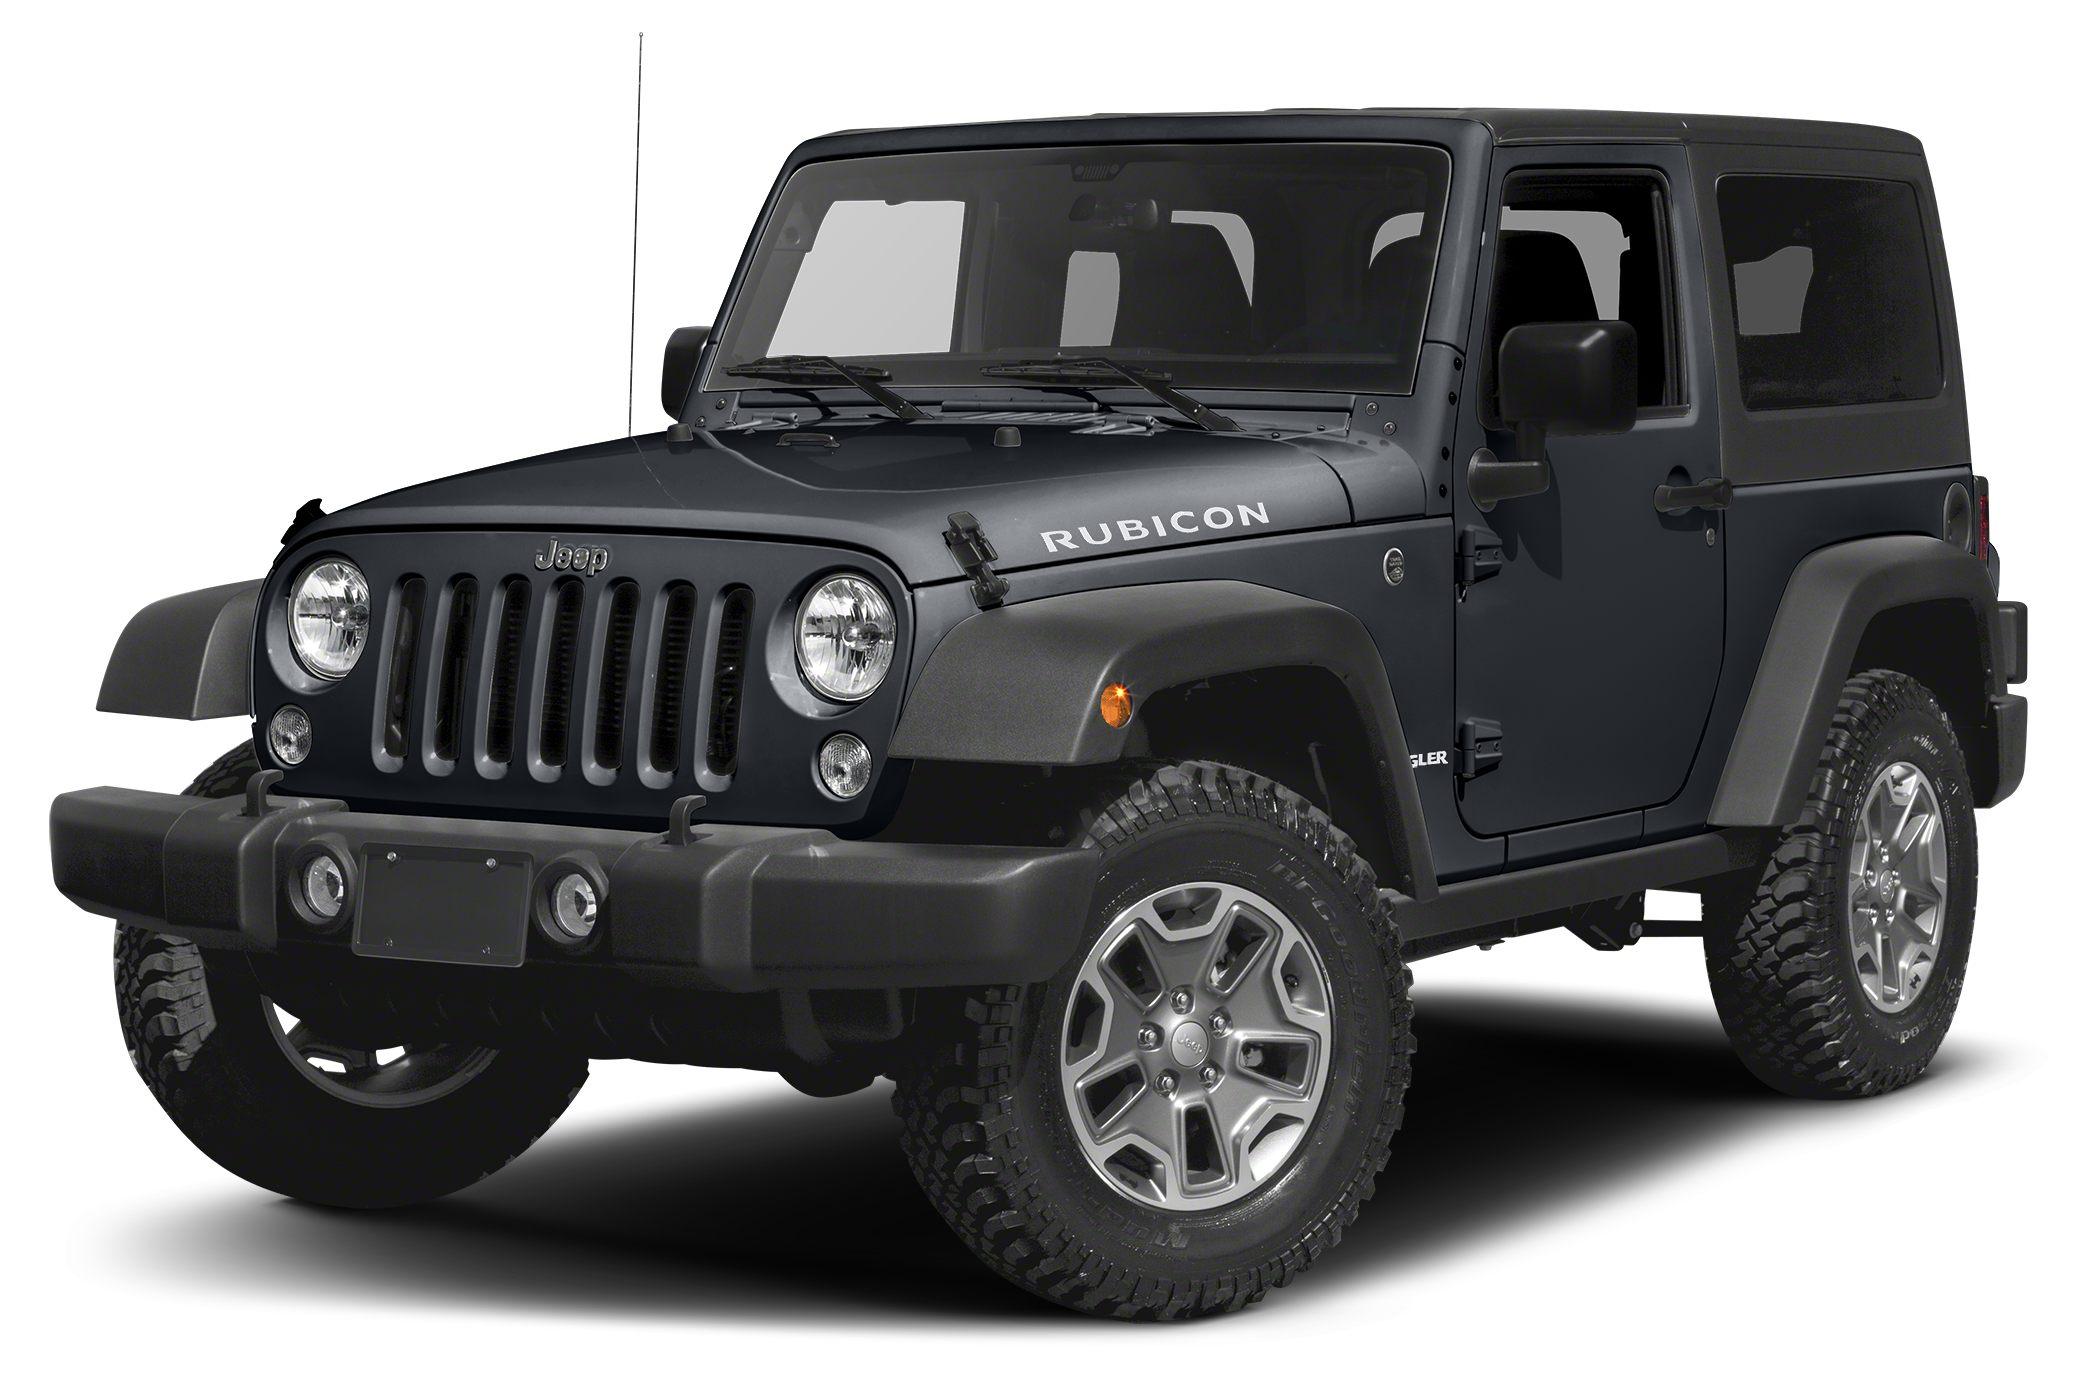 2016 Jeep Wrangler Rubicon Miles 5Color Rhino Clearcoat Stock GL263767 VIN 1C4BJWCGXGL263767